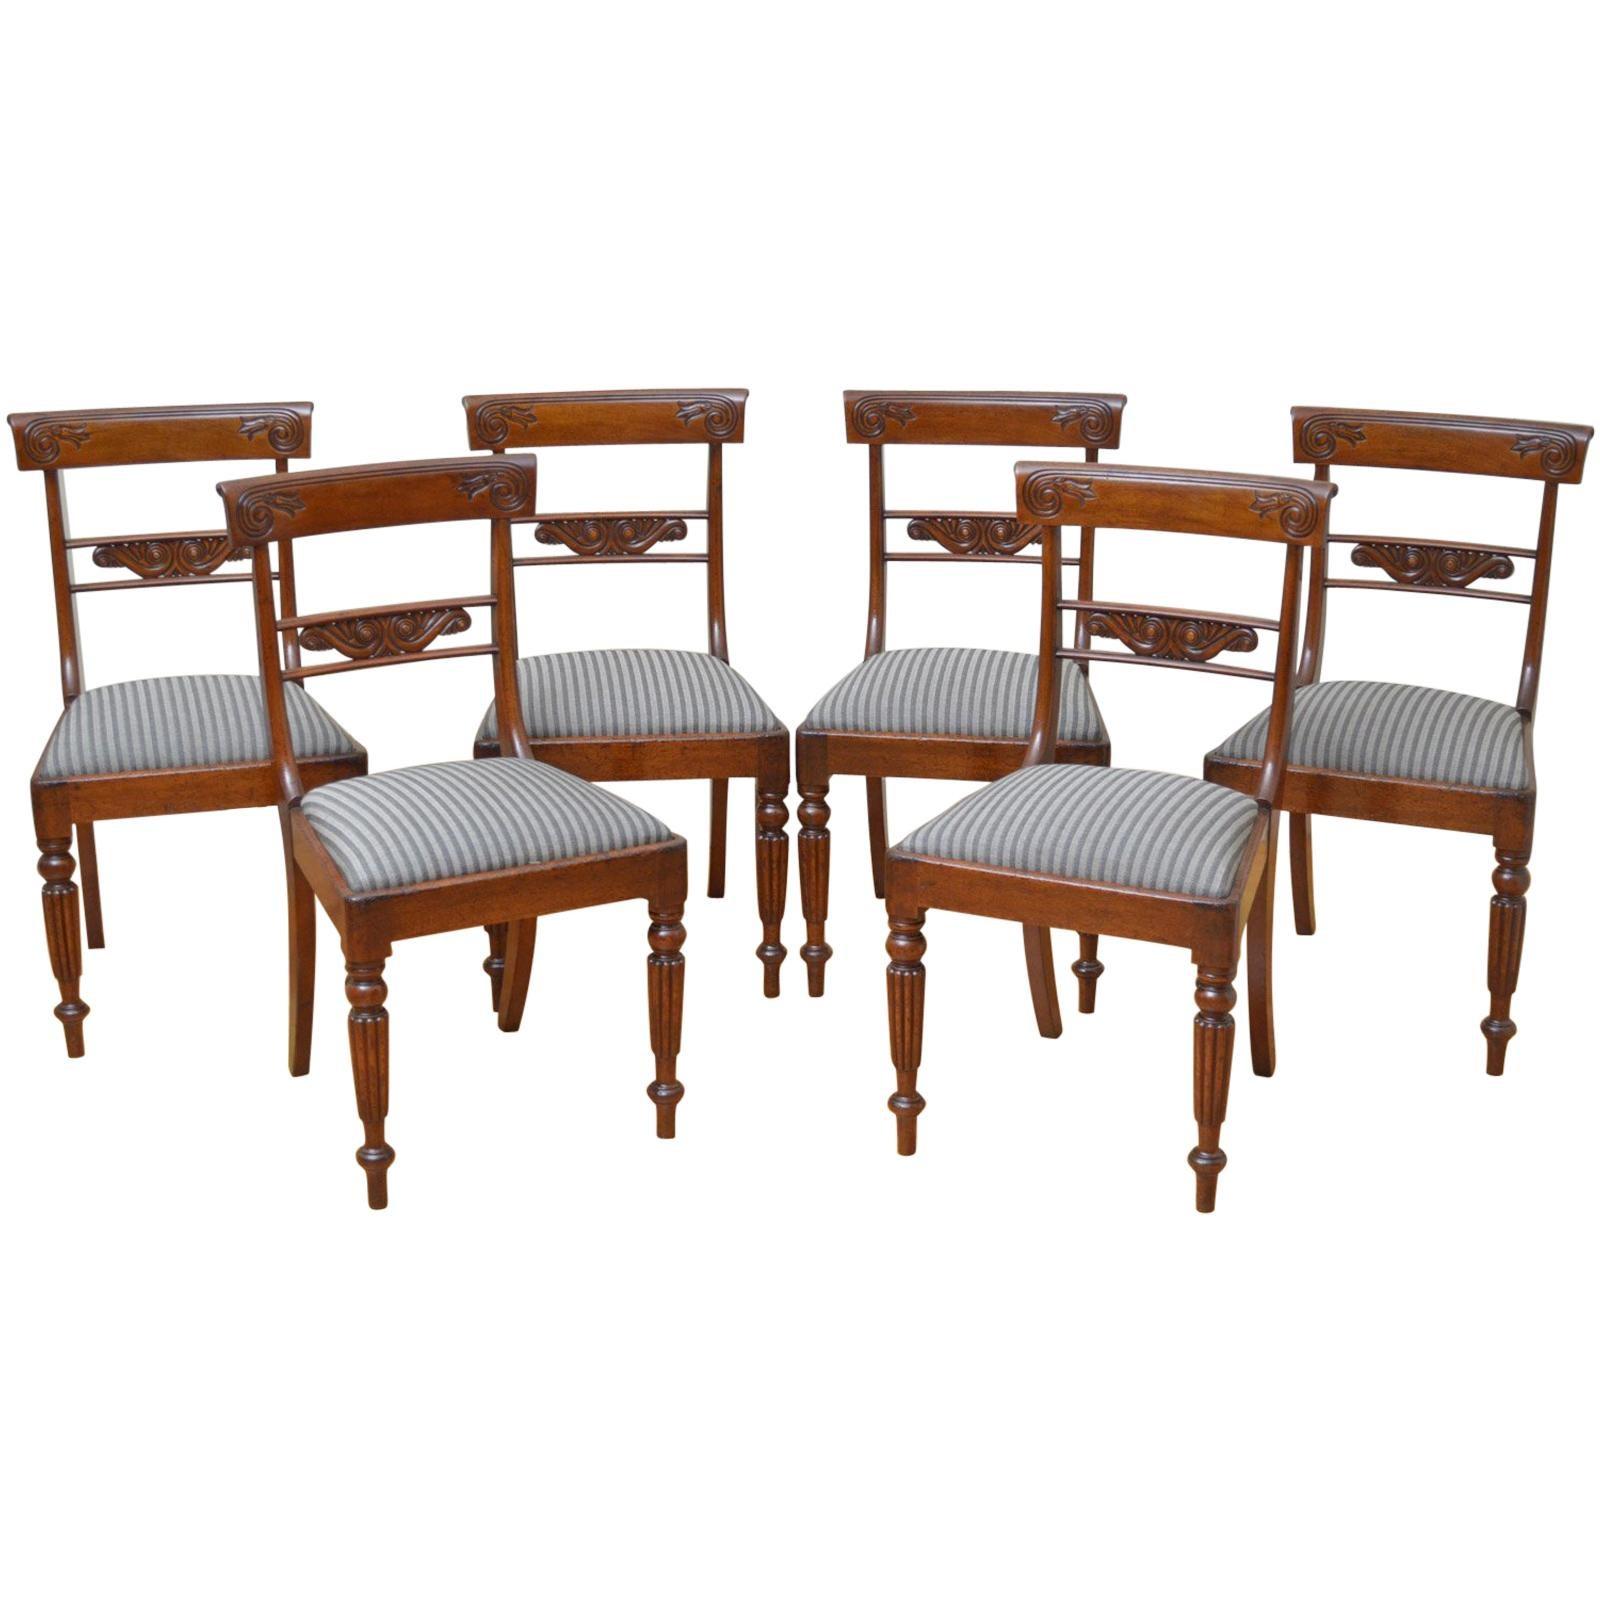 Set of 6 William IV Mahogany Dining Chairs